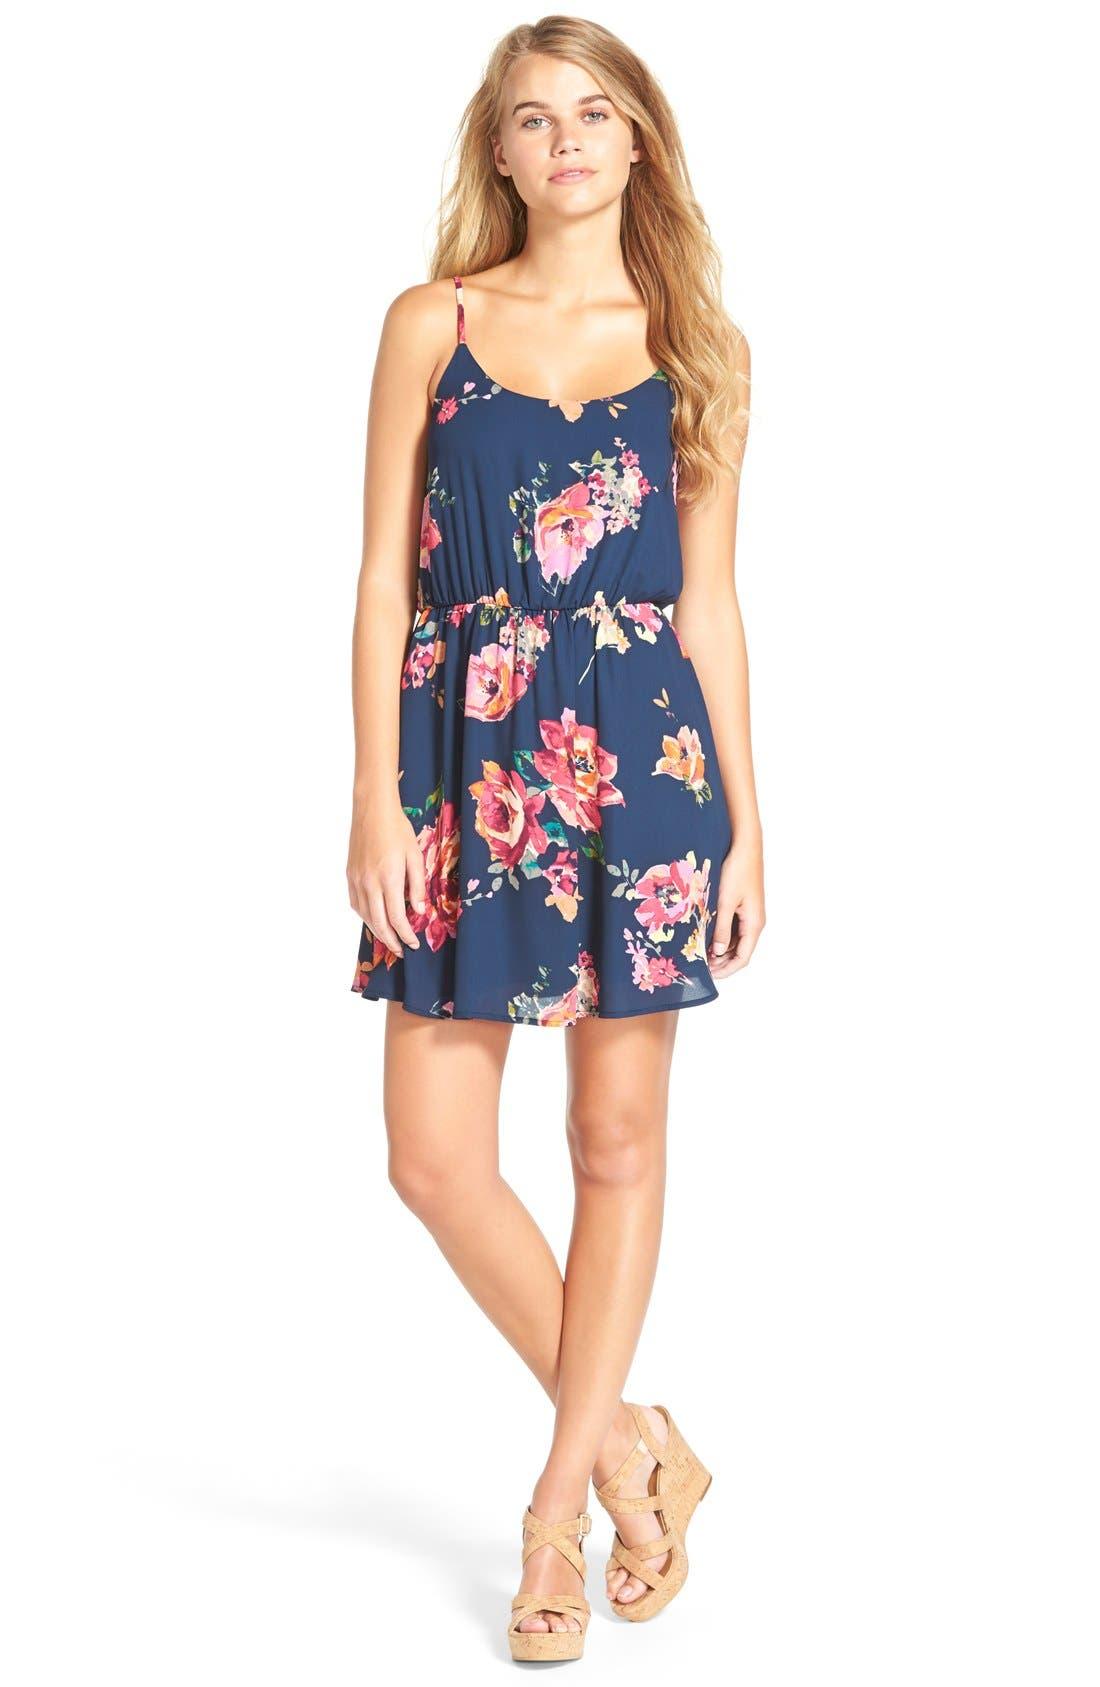 Main Image - Everly Floral Print Strap Back Skater Dress